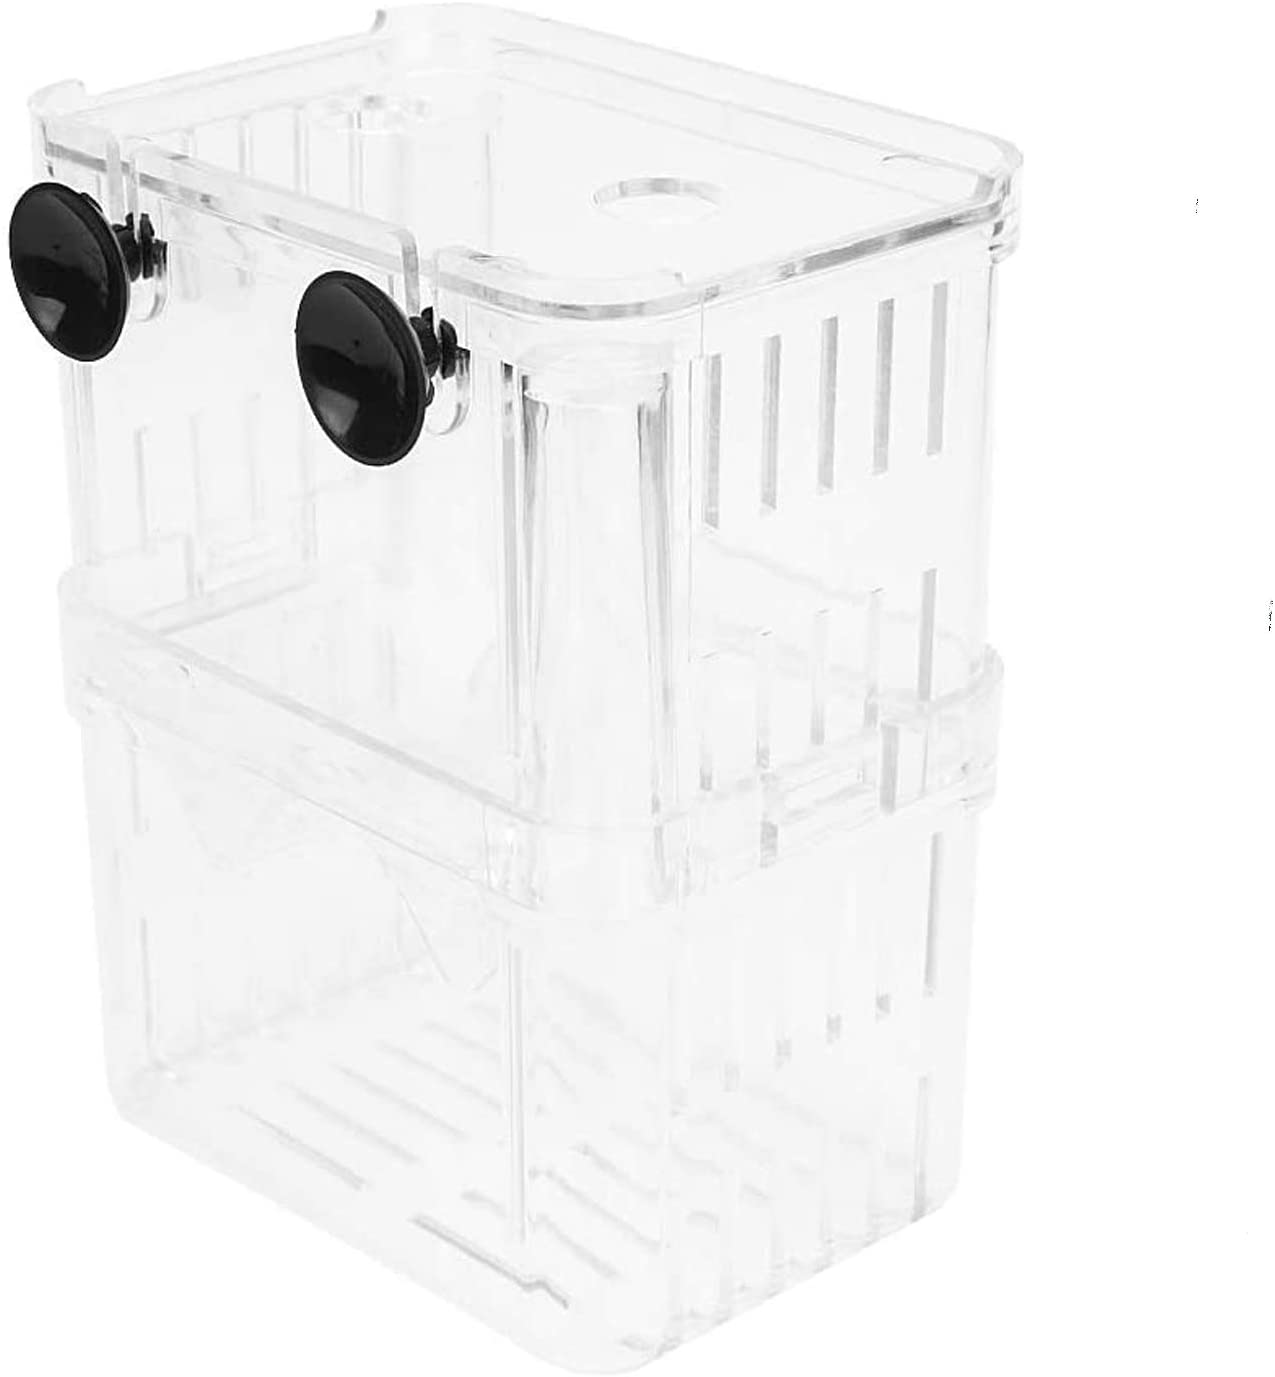 Petzilla in-Tank Aquarium Breeder Box for Fish Tank, Breeding Incubator for Small Fish Hatchery, Acrylic Divider for Shrimp Clownfish Aggressive Fish Injured Fish